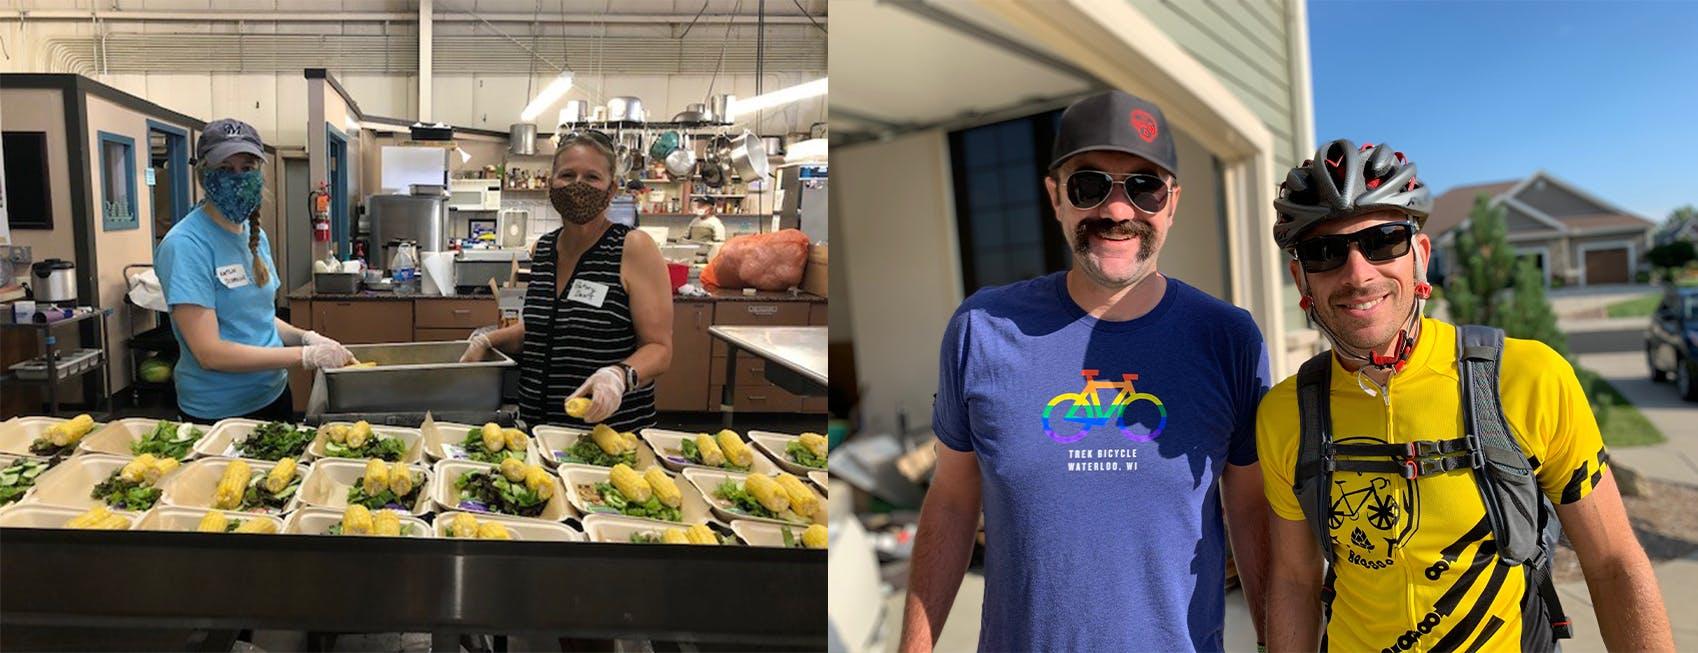 Employees volunteering during Wisconsin's Stewardship Day